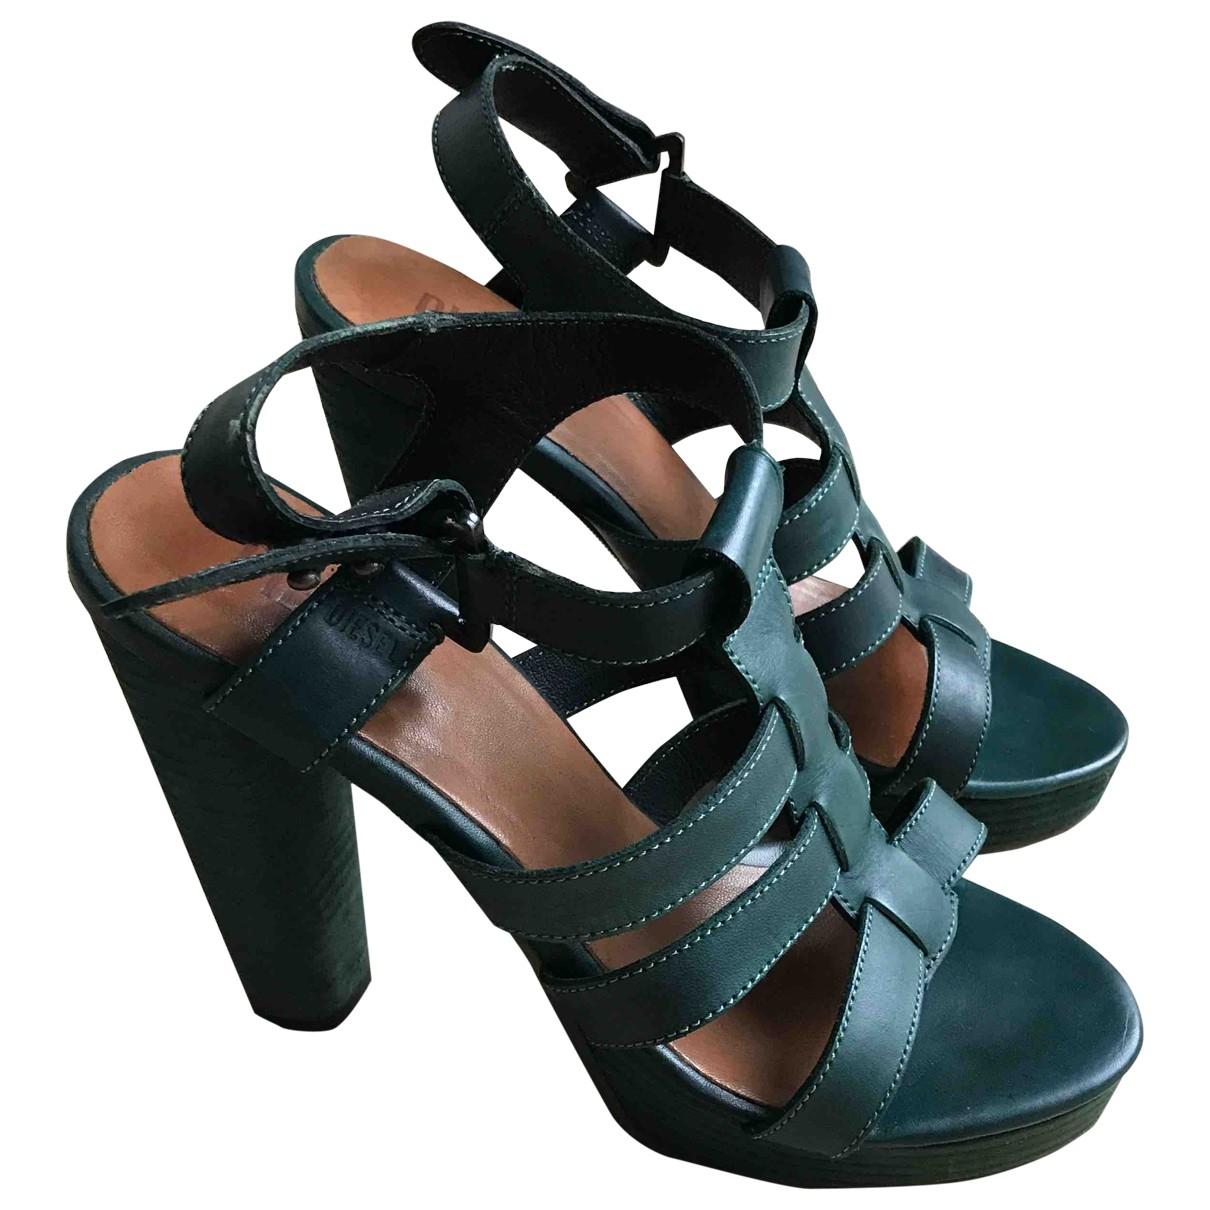 Diesel \N Green Leather Heels for Women 40 EU